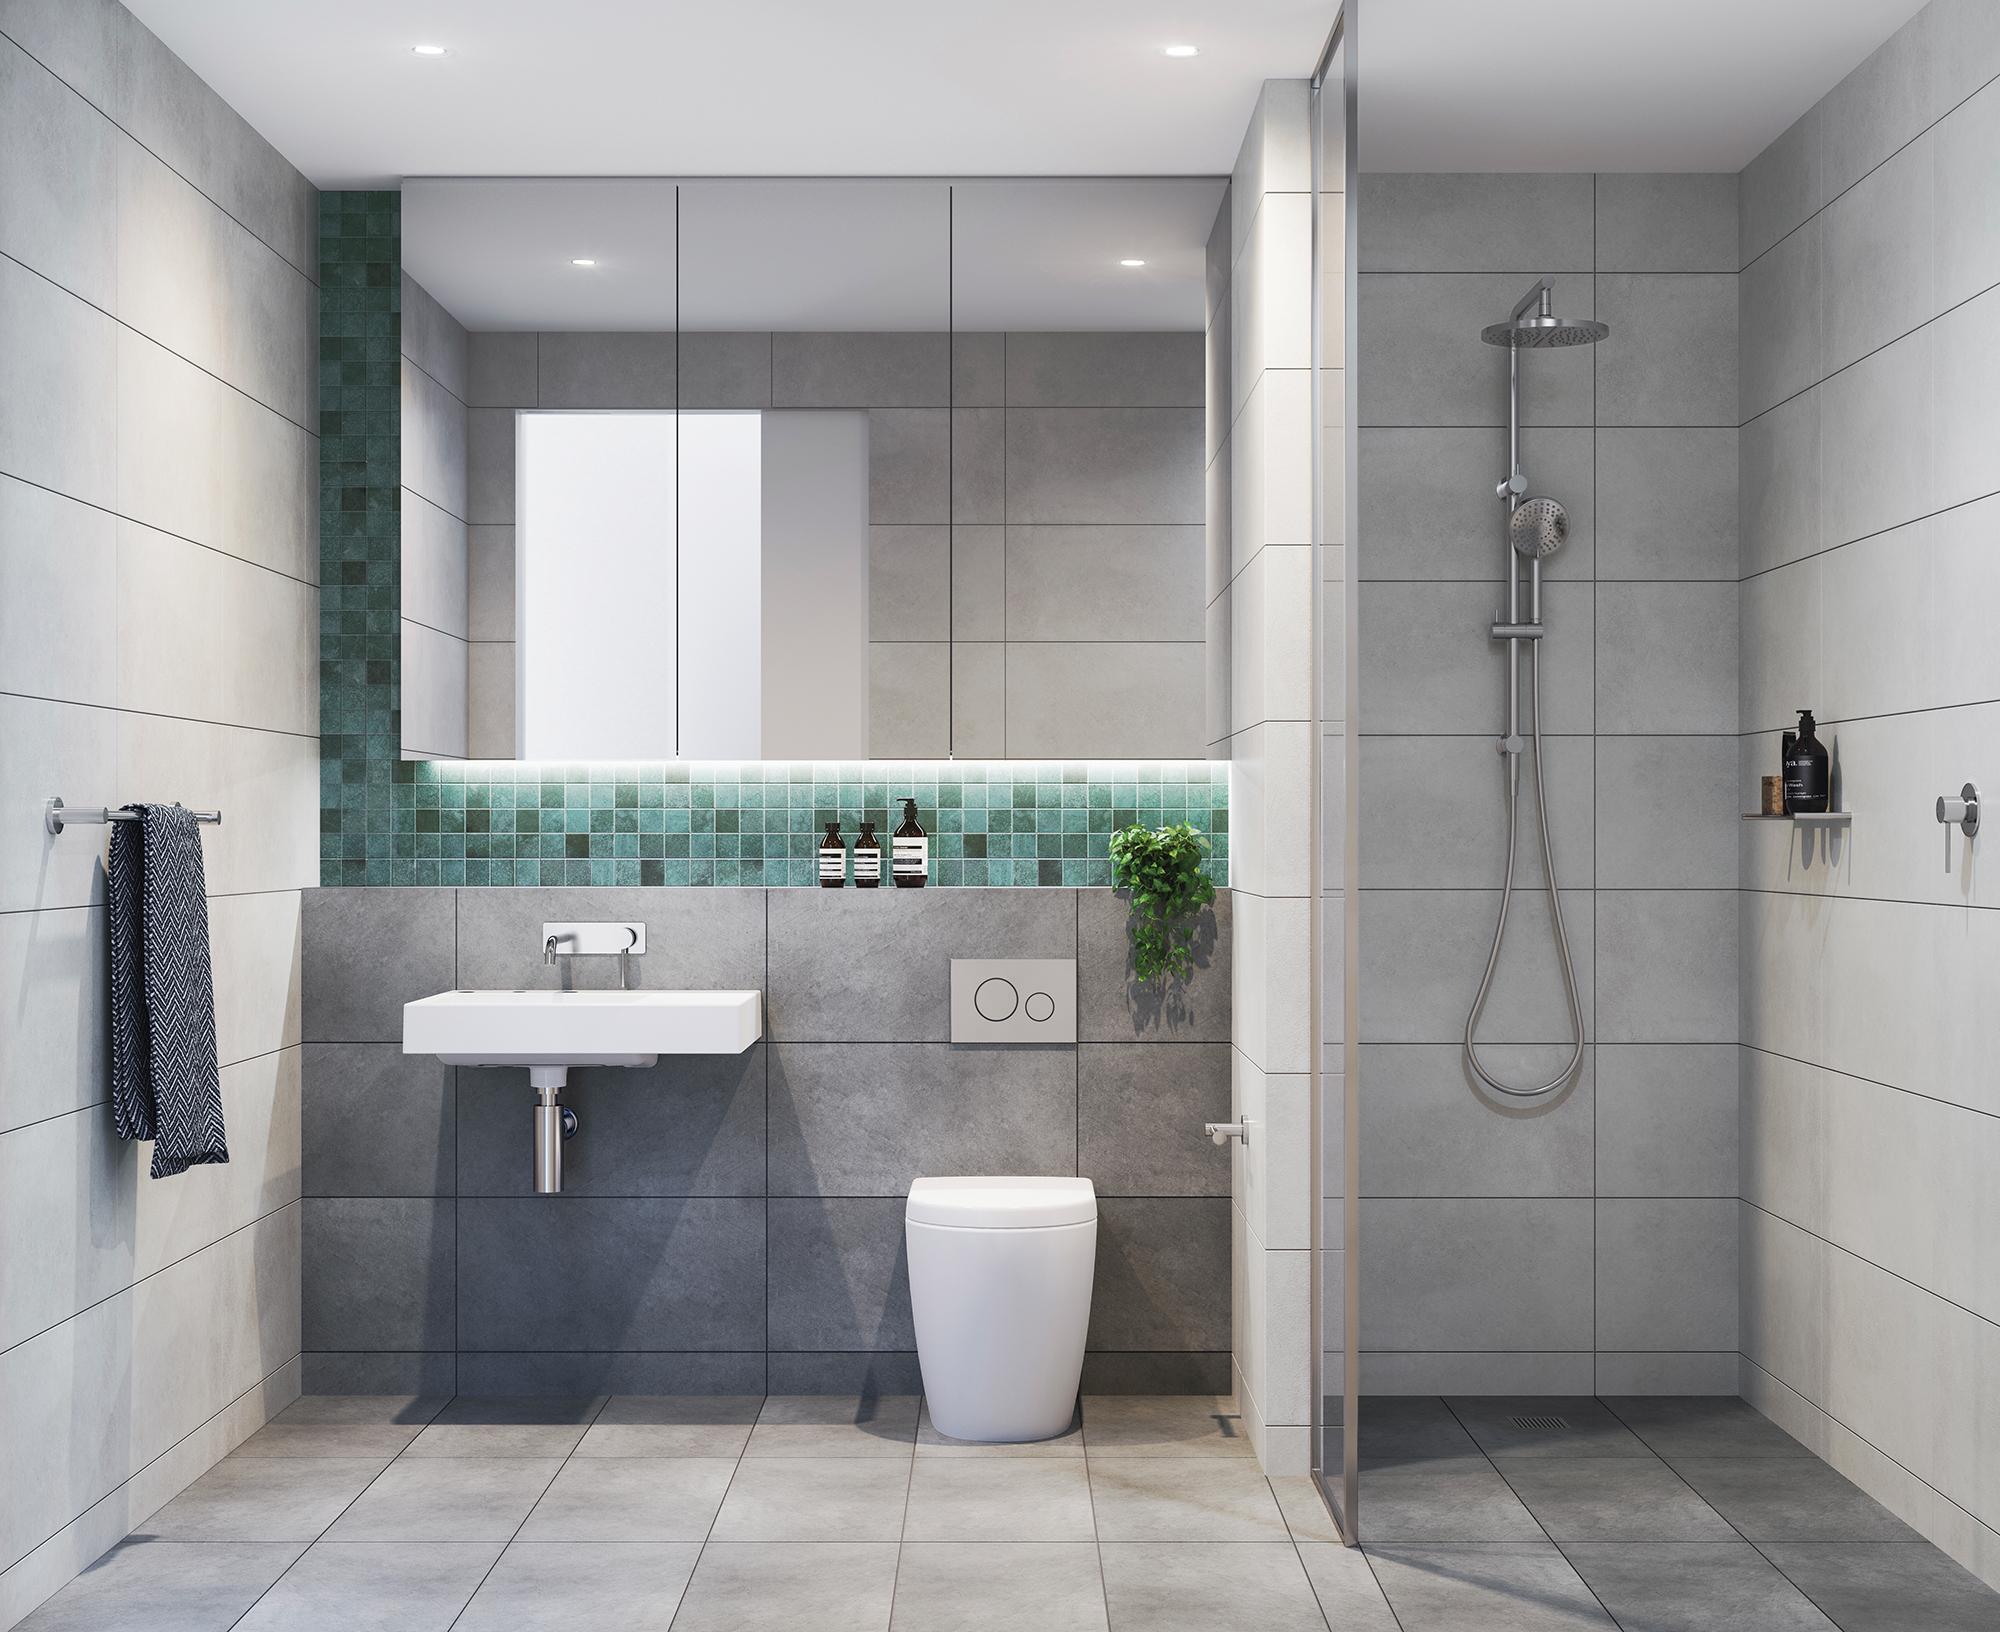 ELM apartments_104 John Street_V05_Bathroom_300dpi_RGB_2000pxlW